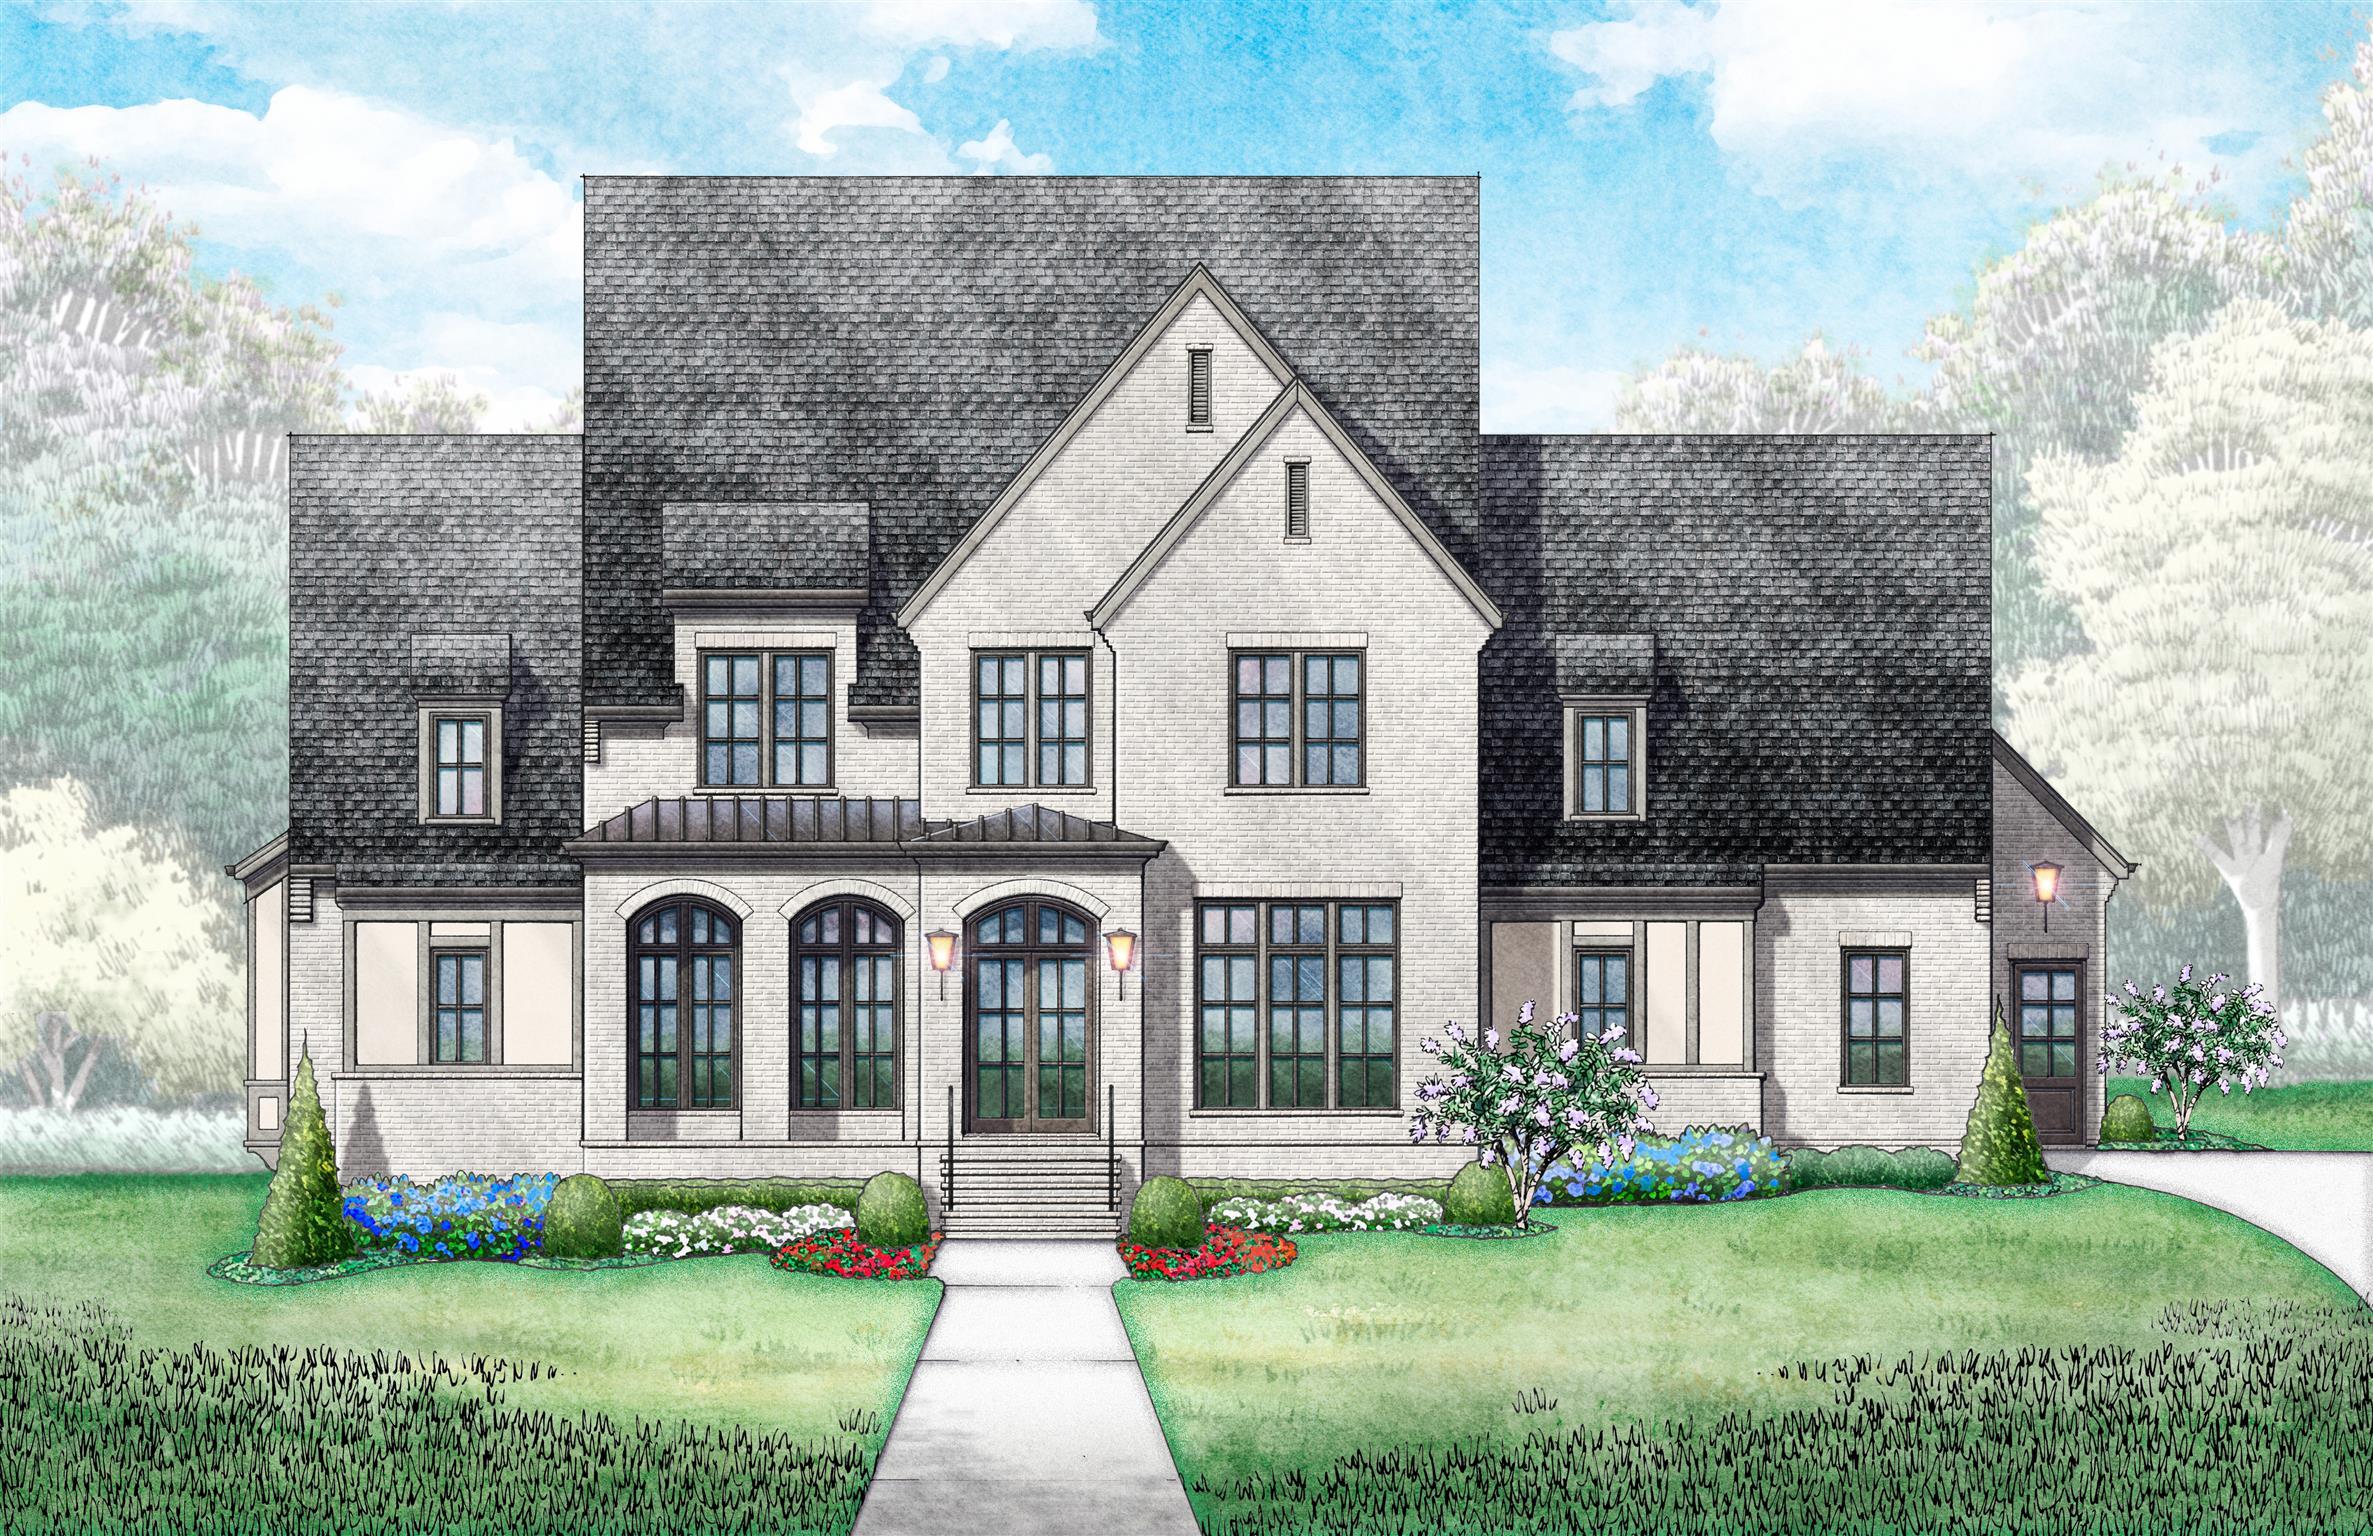 8456 Heirloom Blvd (Lot 6036), College Grove, TN 37046 - College Grove, TN real estate listing